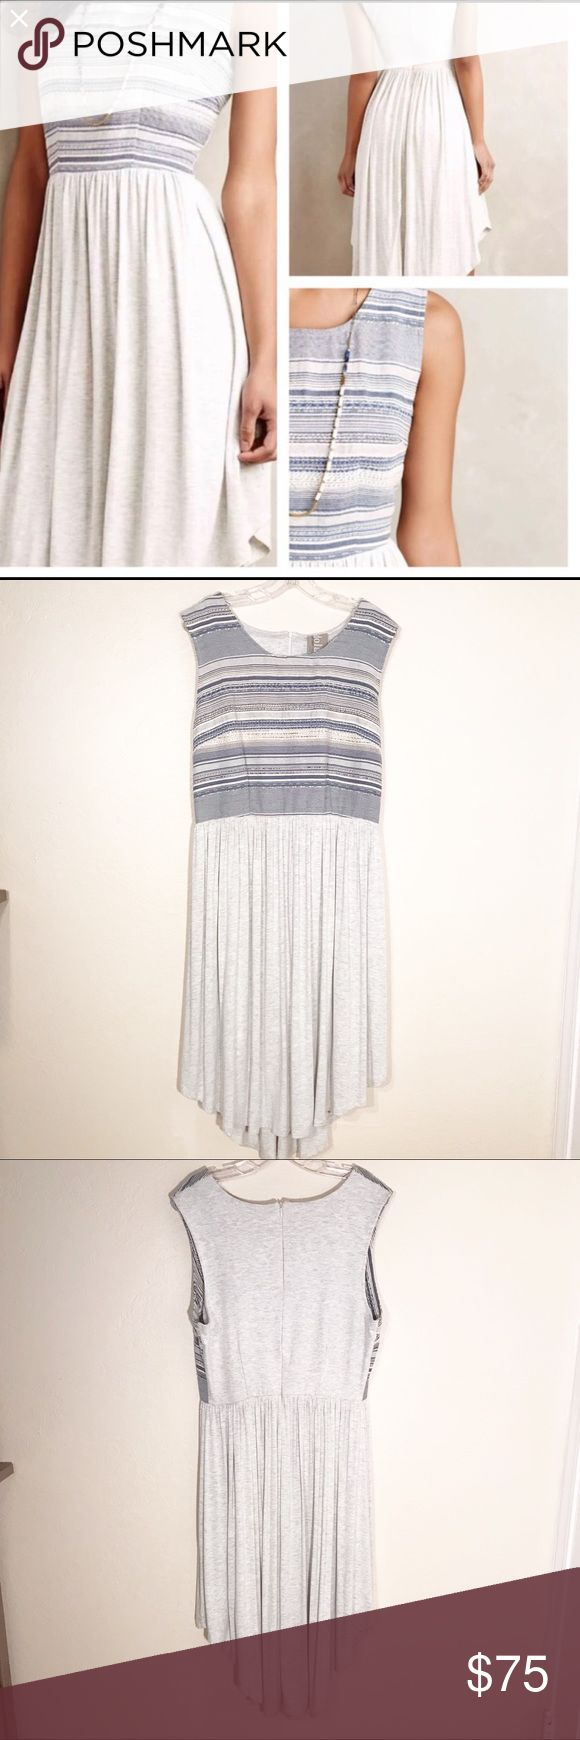 6a28c2ec9cf5f Anthropologie Dolan Left Coast Sabado Dress NWT Anthropologie Dolan Left  Coast Sabado Dress XL, fit